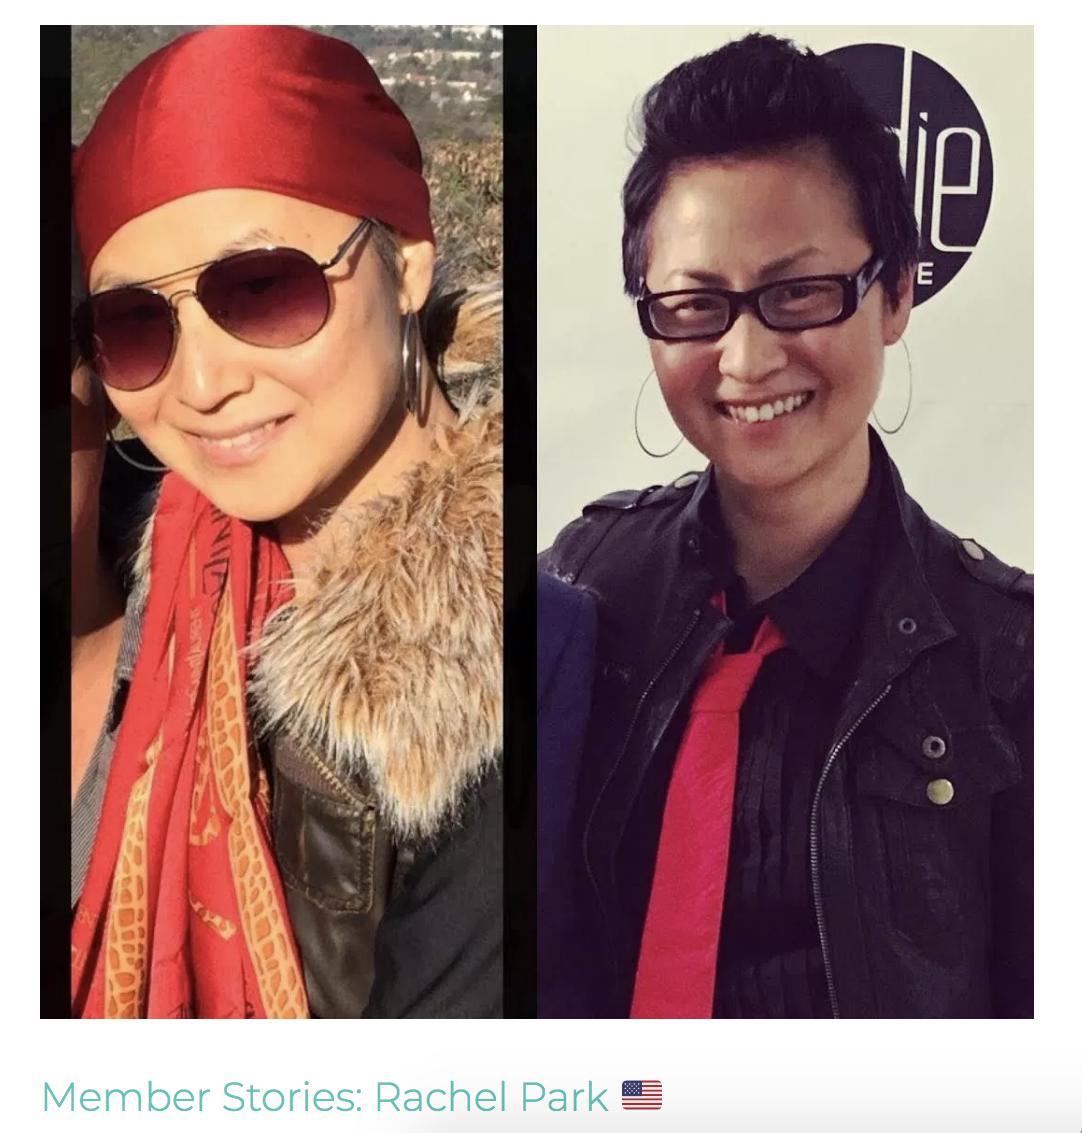 Ladies-Be-Architects-Member-Stories-Rachel-Park.png